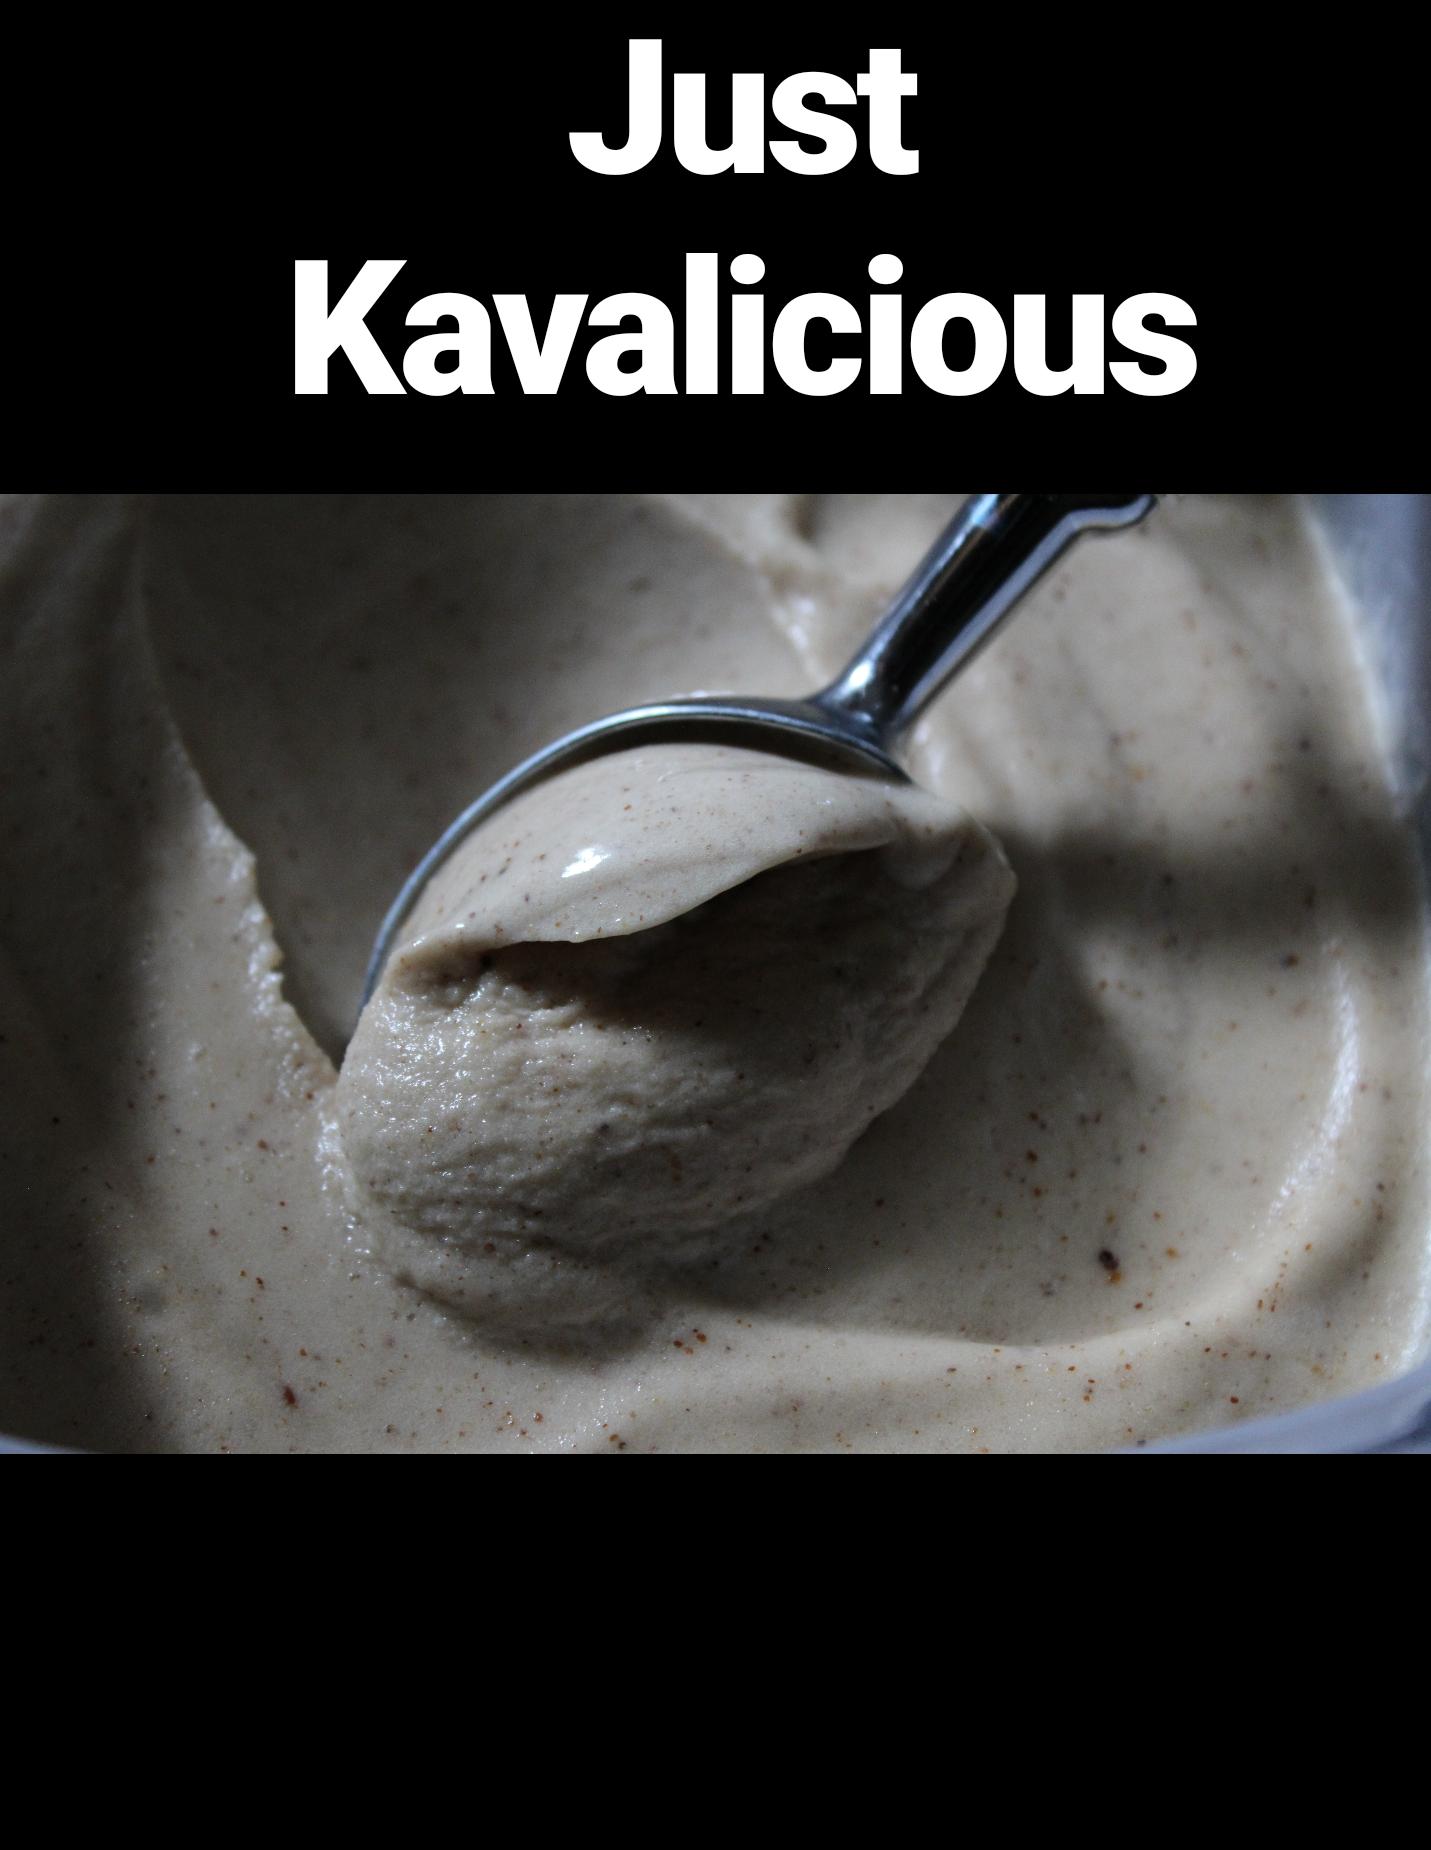 Just Kavalicious – The Beginning